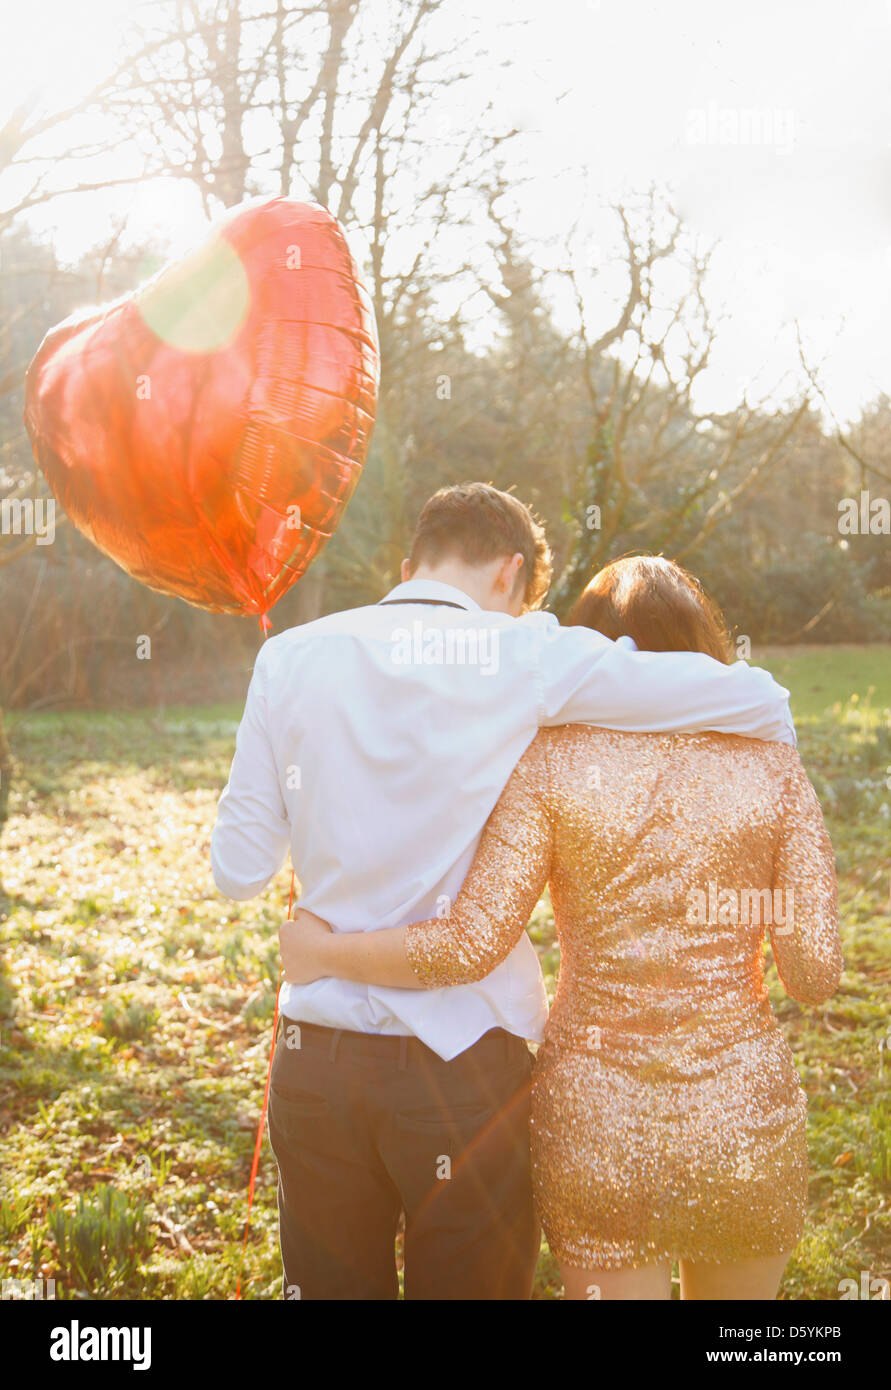 Paar im Park hält herzförmige Ballon, hintere Ansicht Stockbild